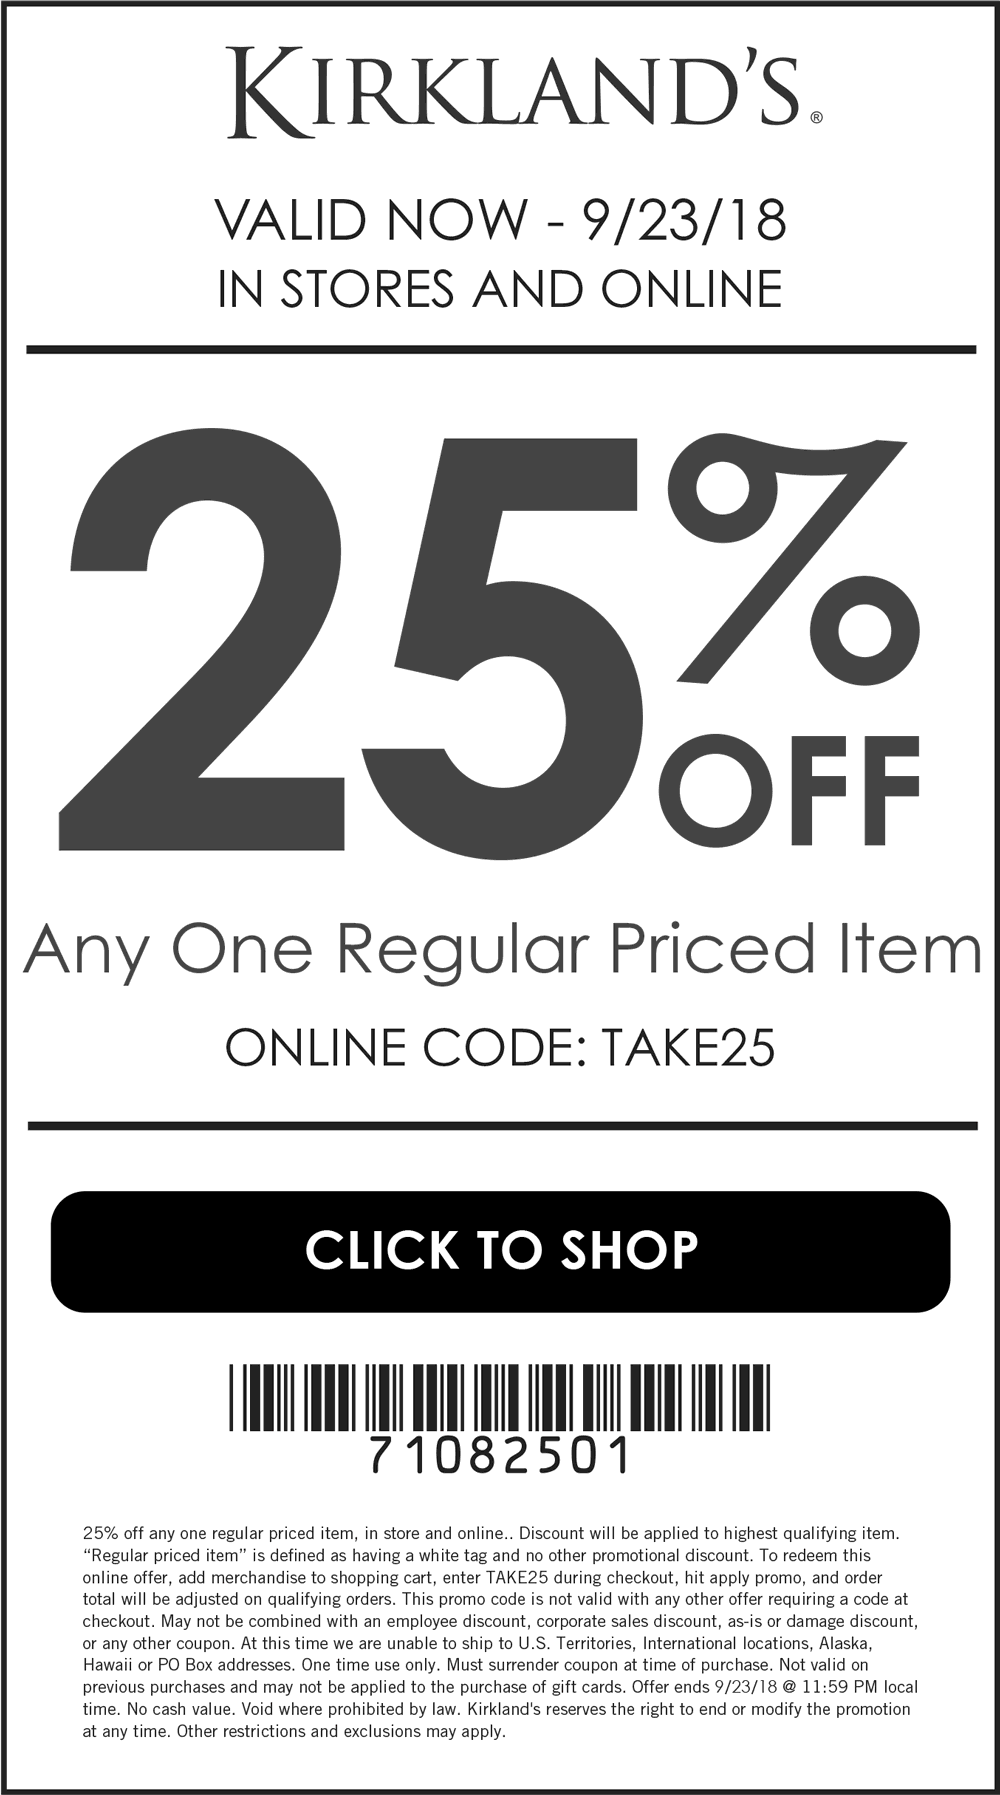 Kirklands Coupon May 2020 25% off a single item at Kirklands, or online via promo code TAKE25